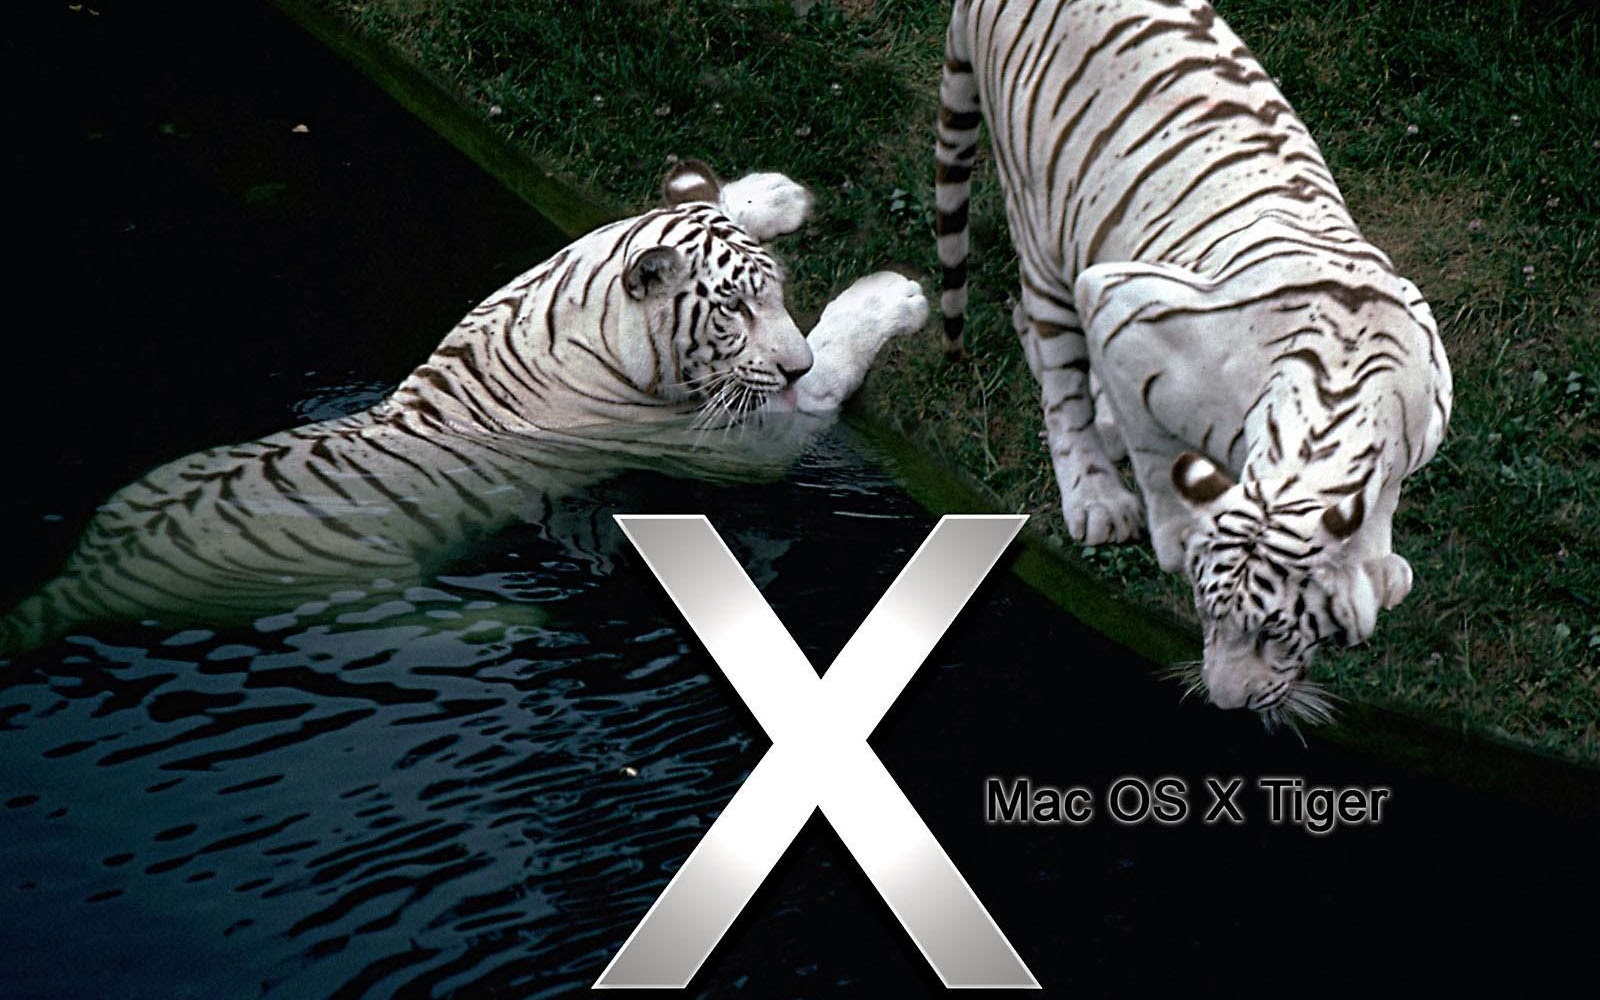 wallpapers Mac OS X Tiger Wallpapers 1600x1000